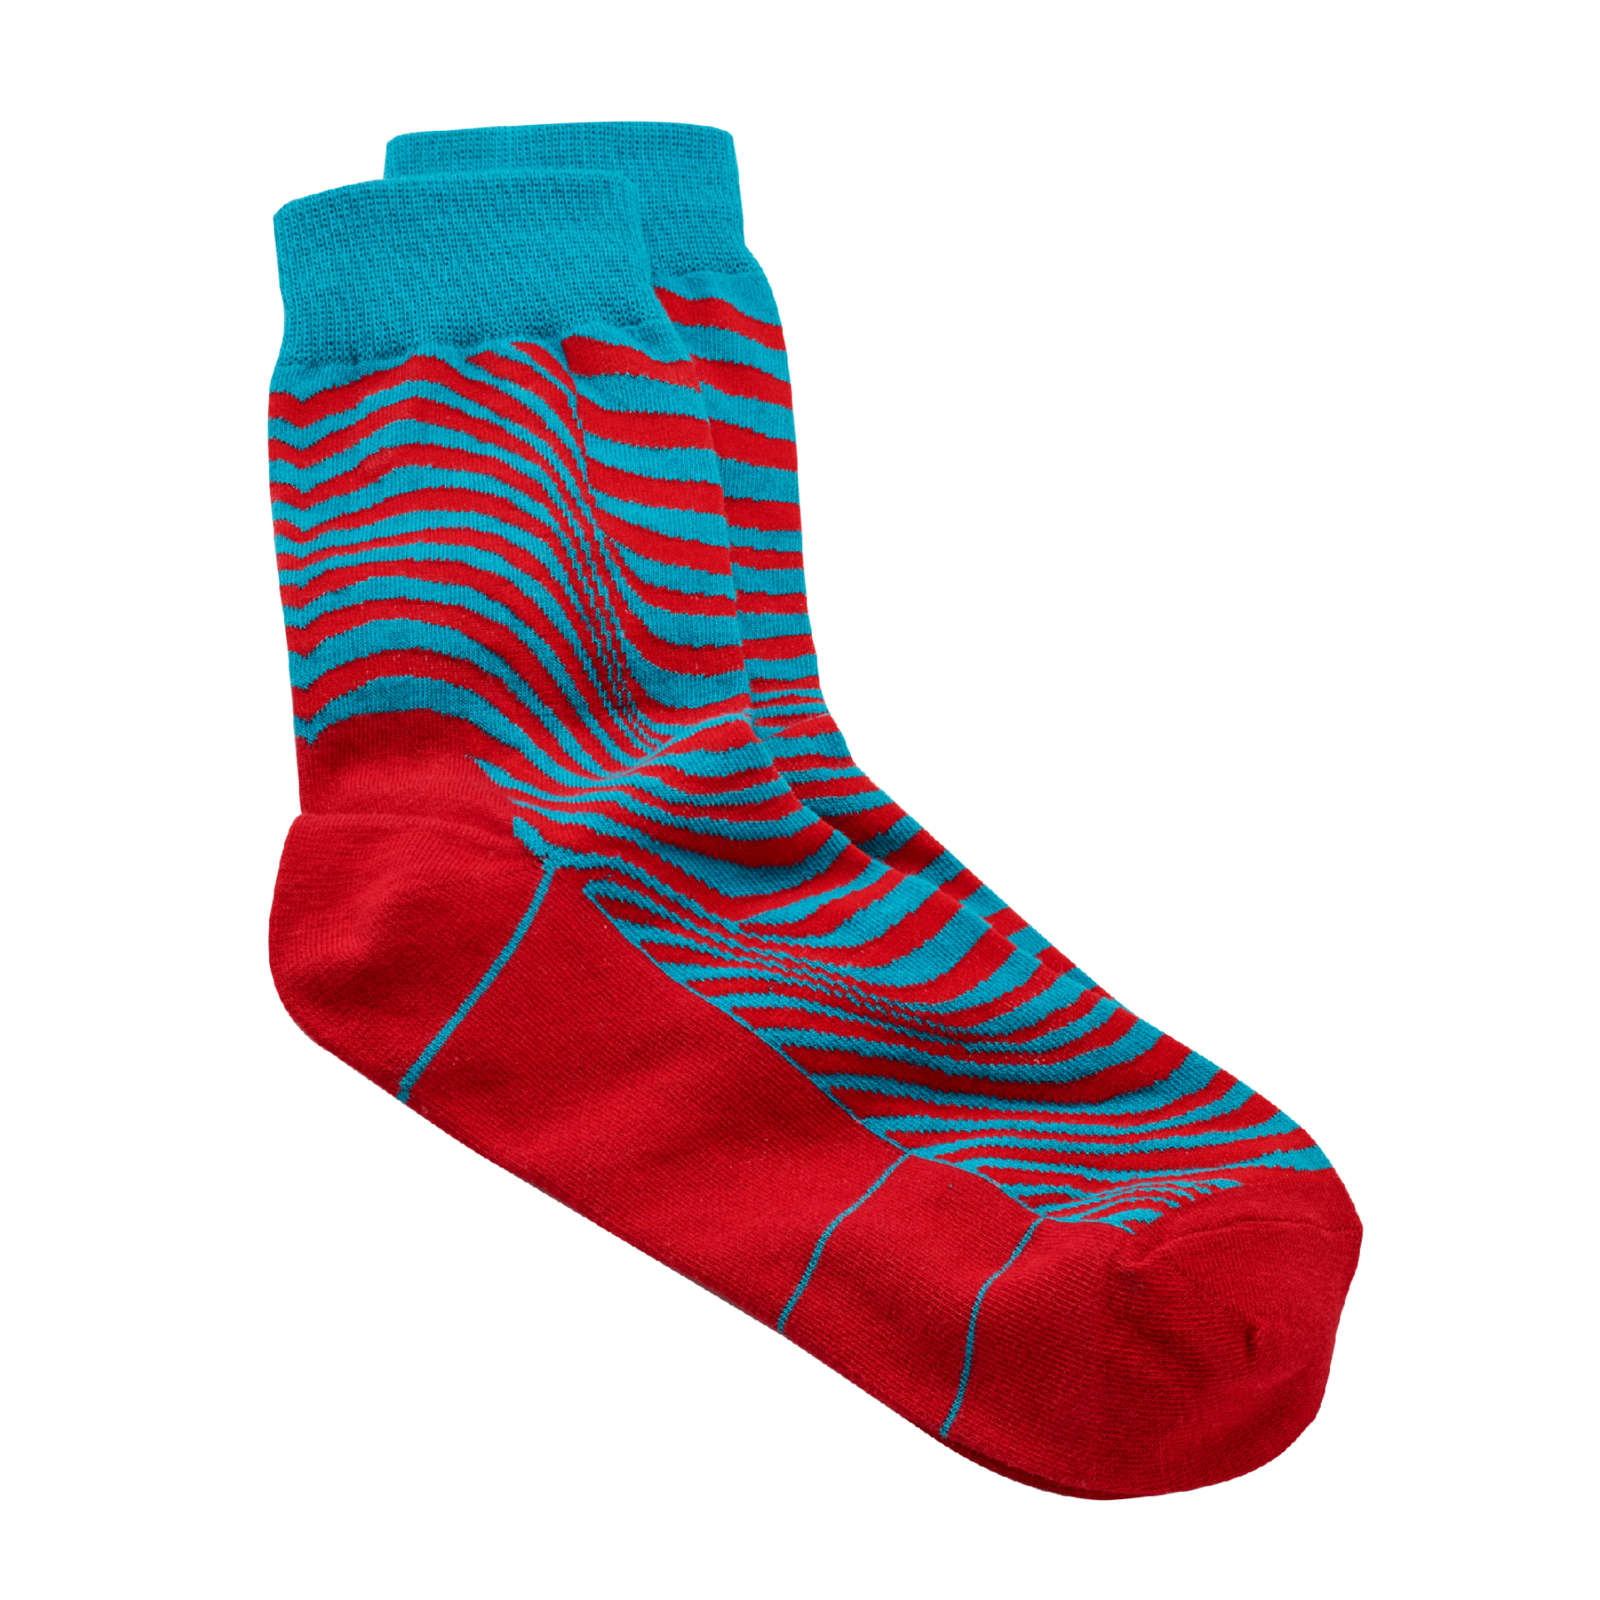 ID.3 Socken (Gr. 39-42)